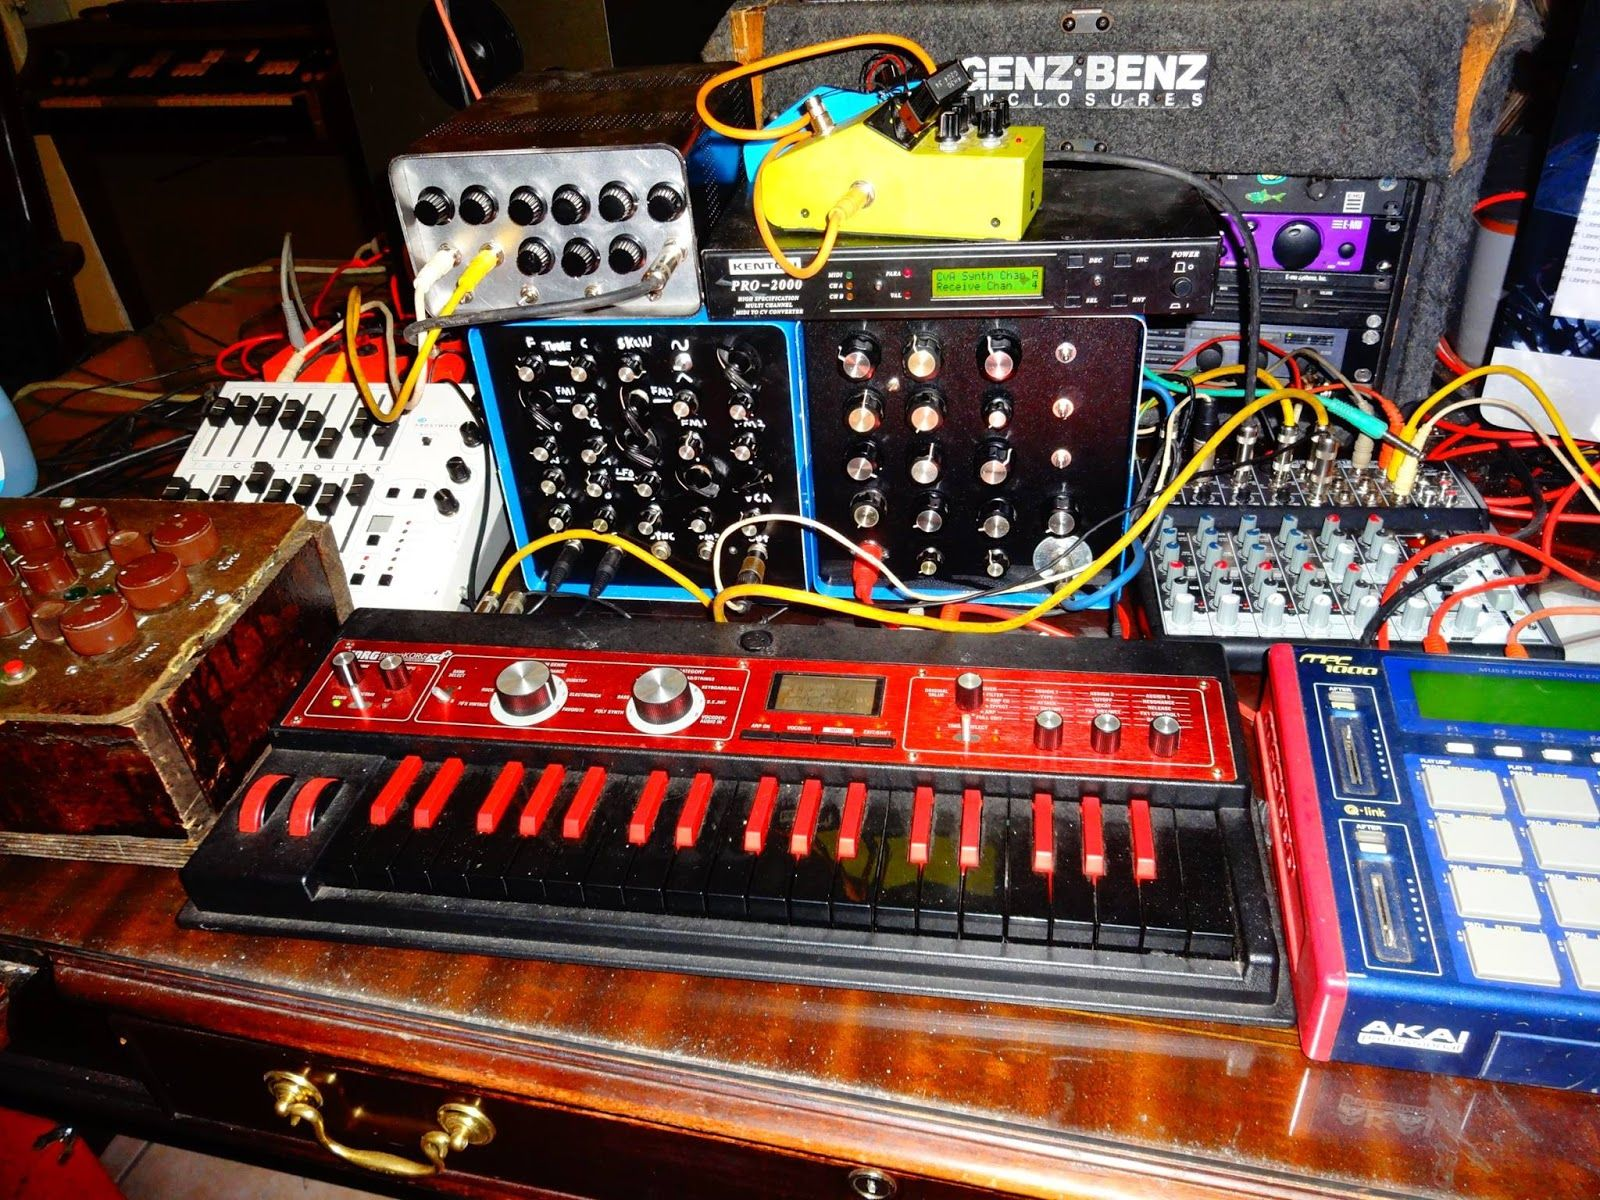 Bent Tronicscom Circuit Bending Diy Synth Guru Dave Wright Not Bre Circuitbending Circuitbent Noise Toys By Cementimental